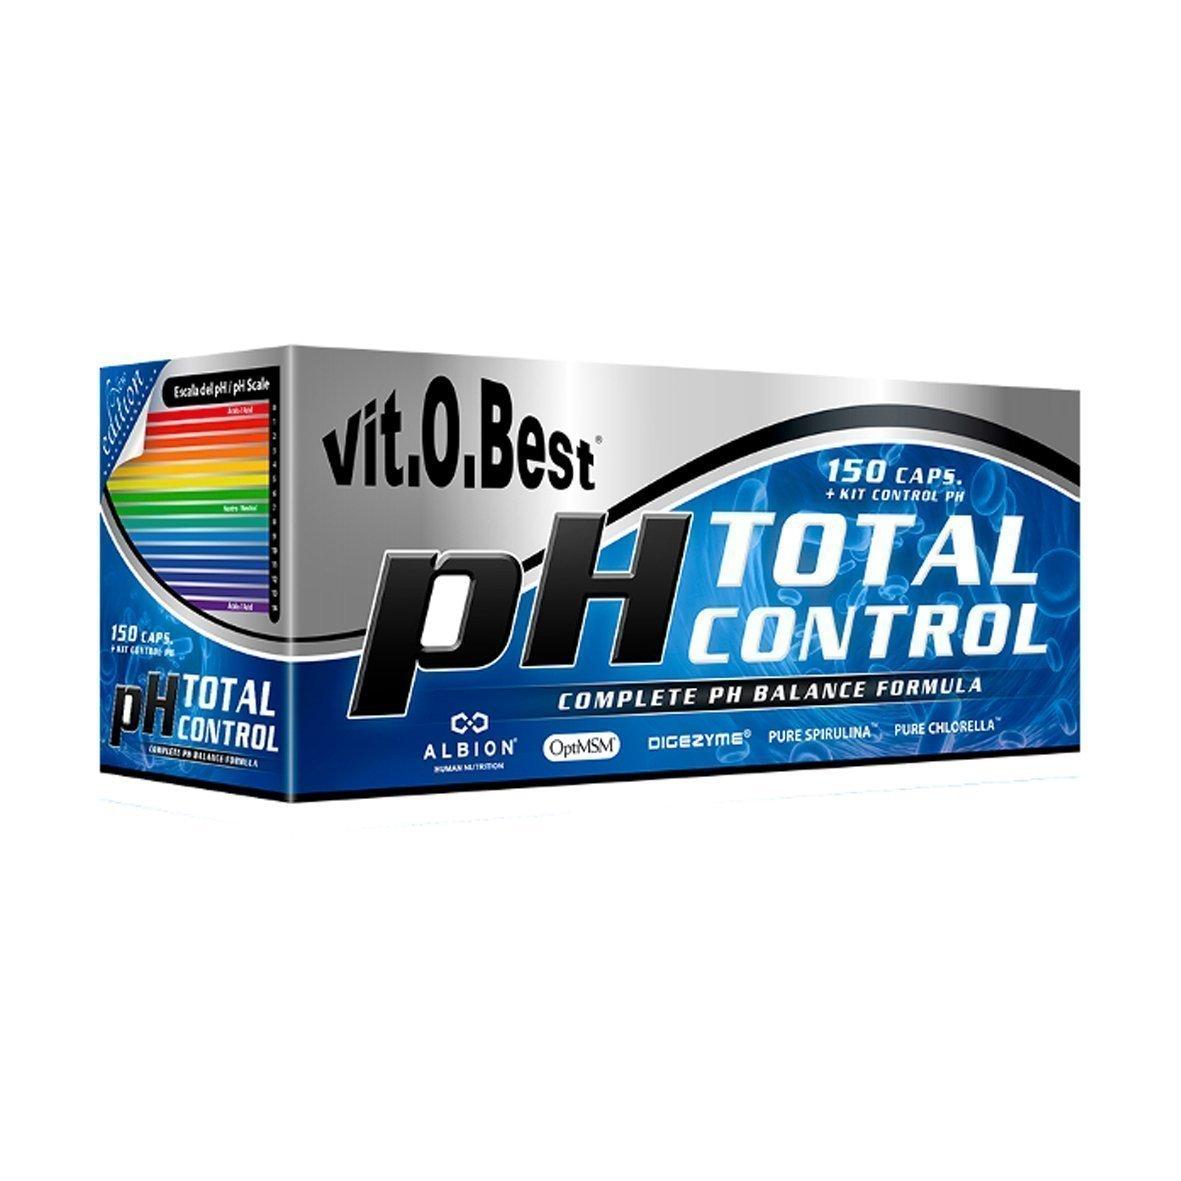 PH Total Control 150 caps